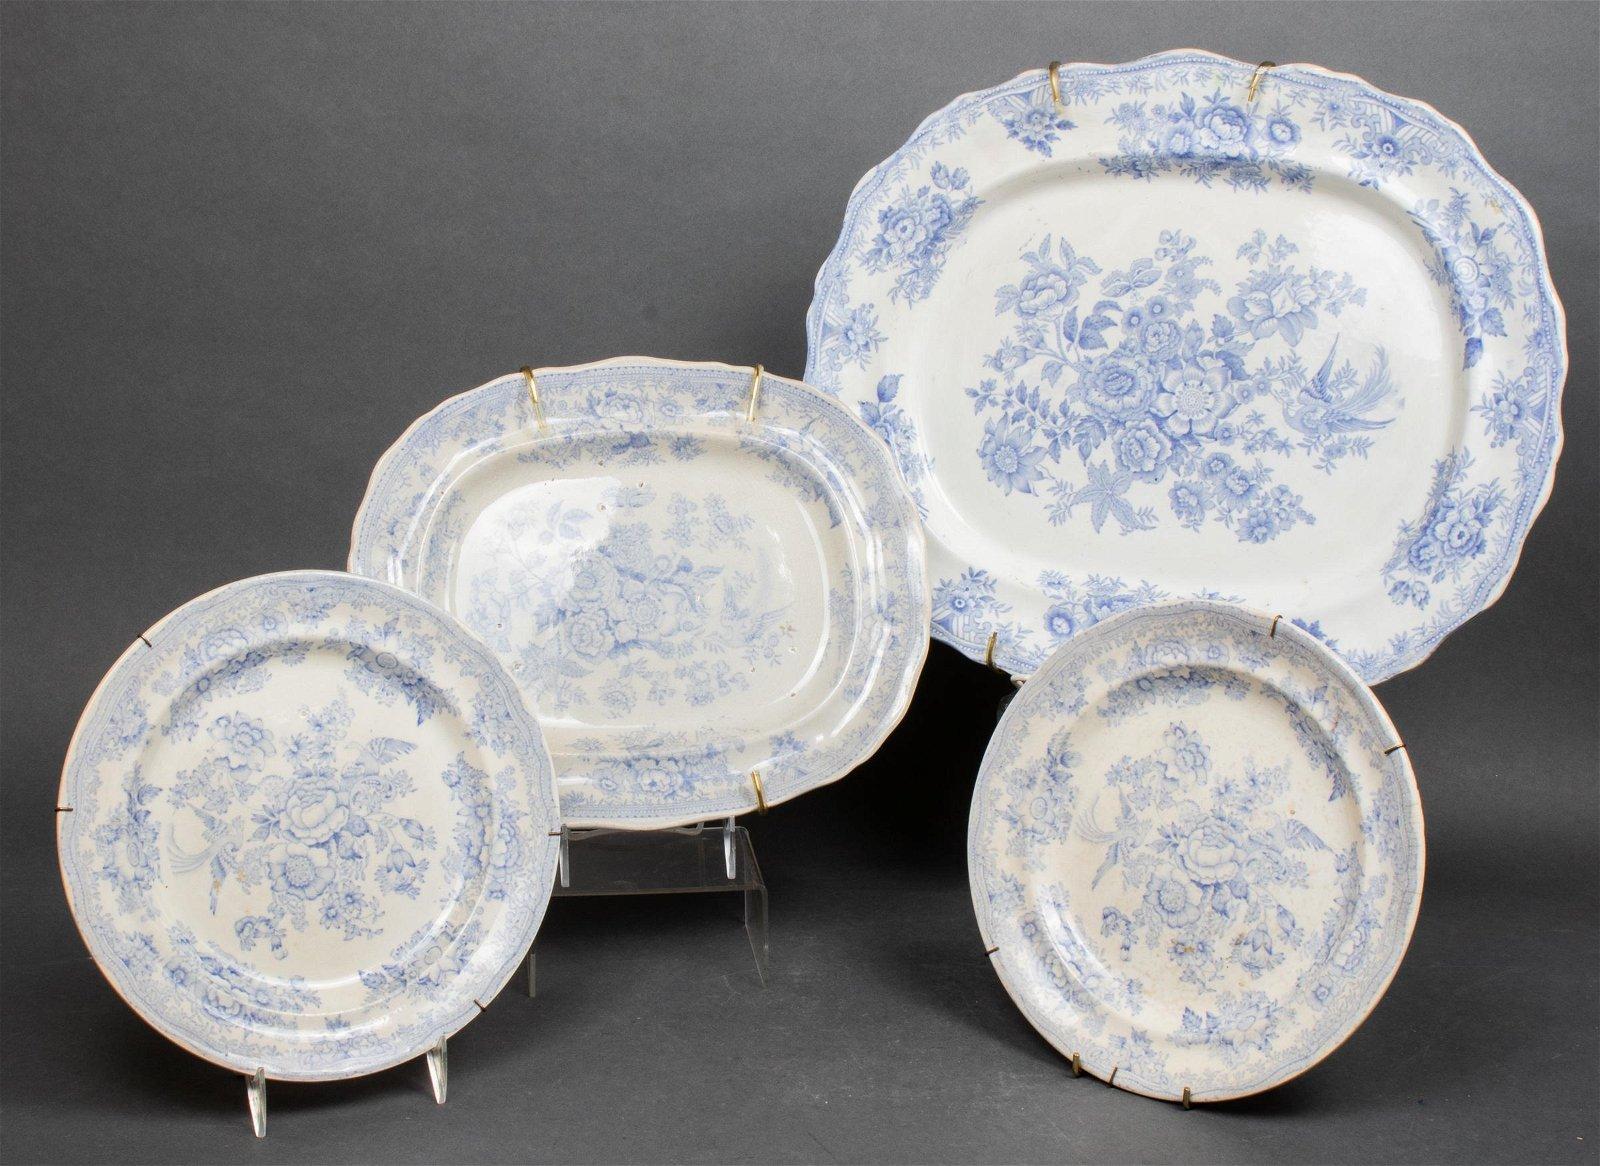 English Asiatic Pheasant Transferware Plates, 4